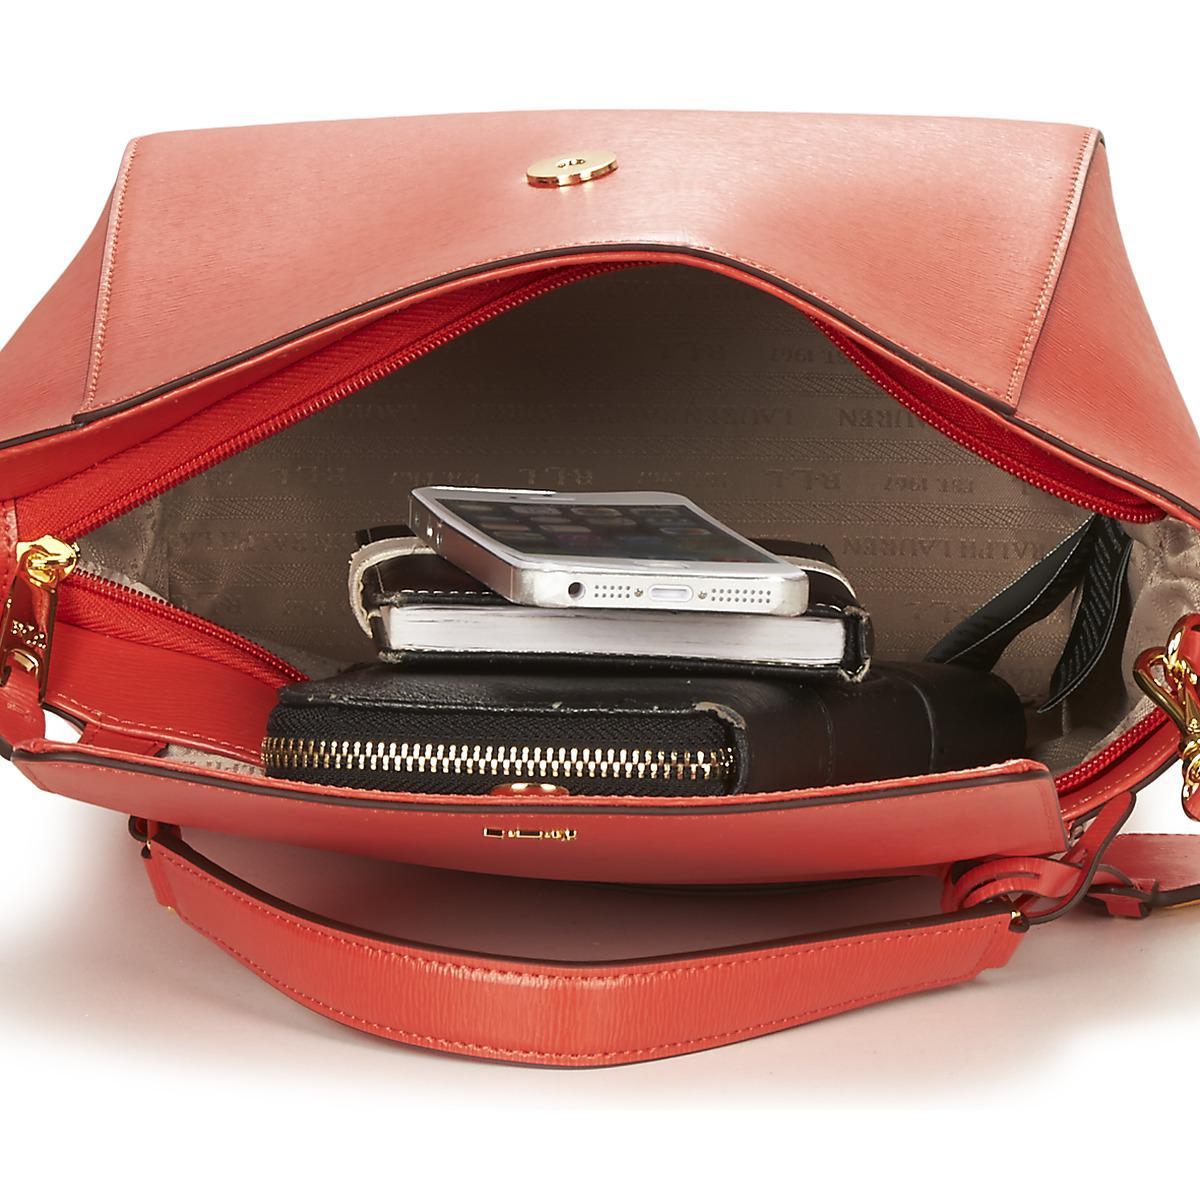 12fc5ffc0ab8 Ralph Lauren Newbury Barclay Crossbody Women s Handbags In Red in ...